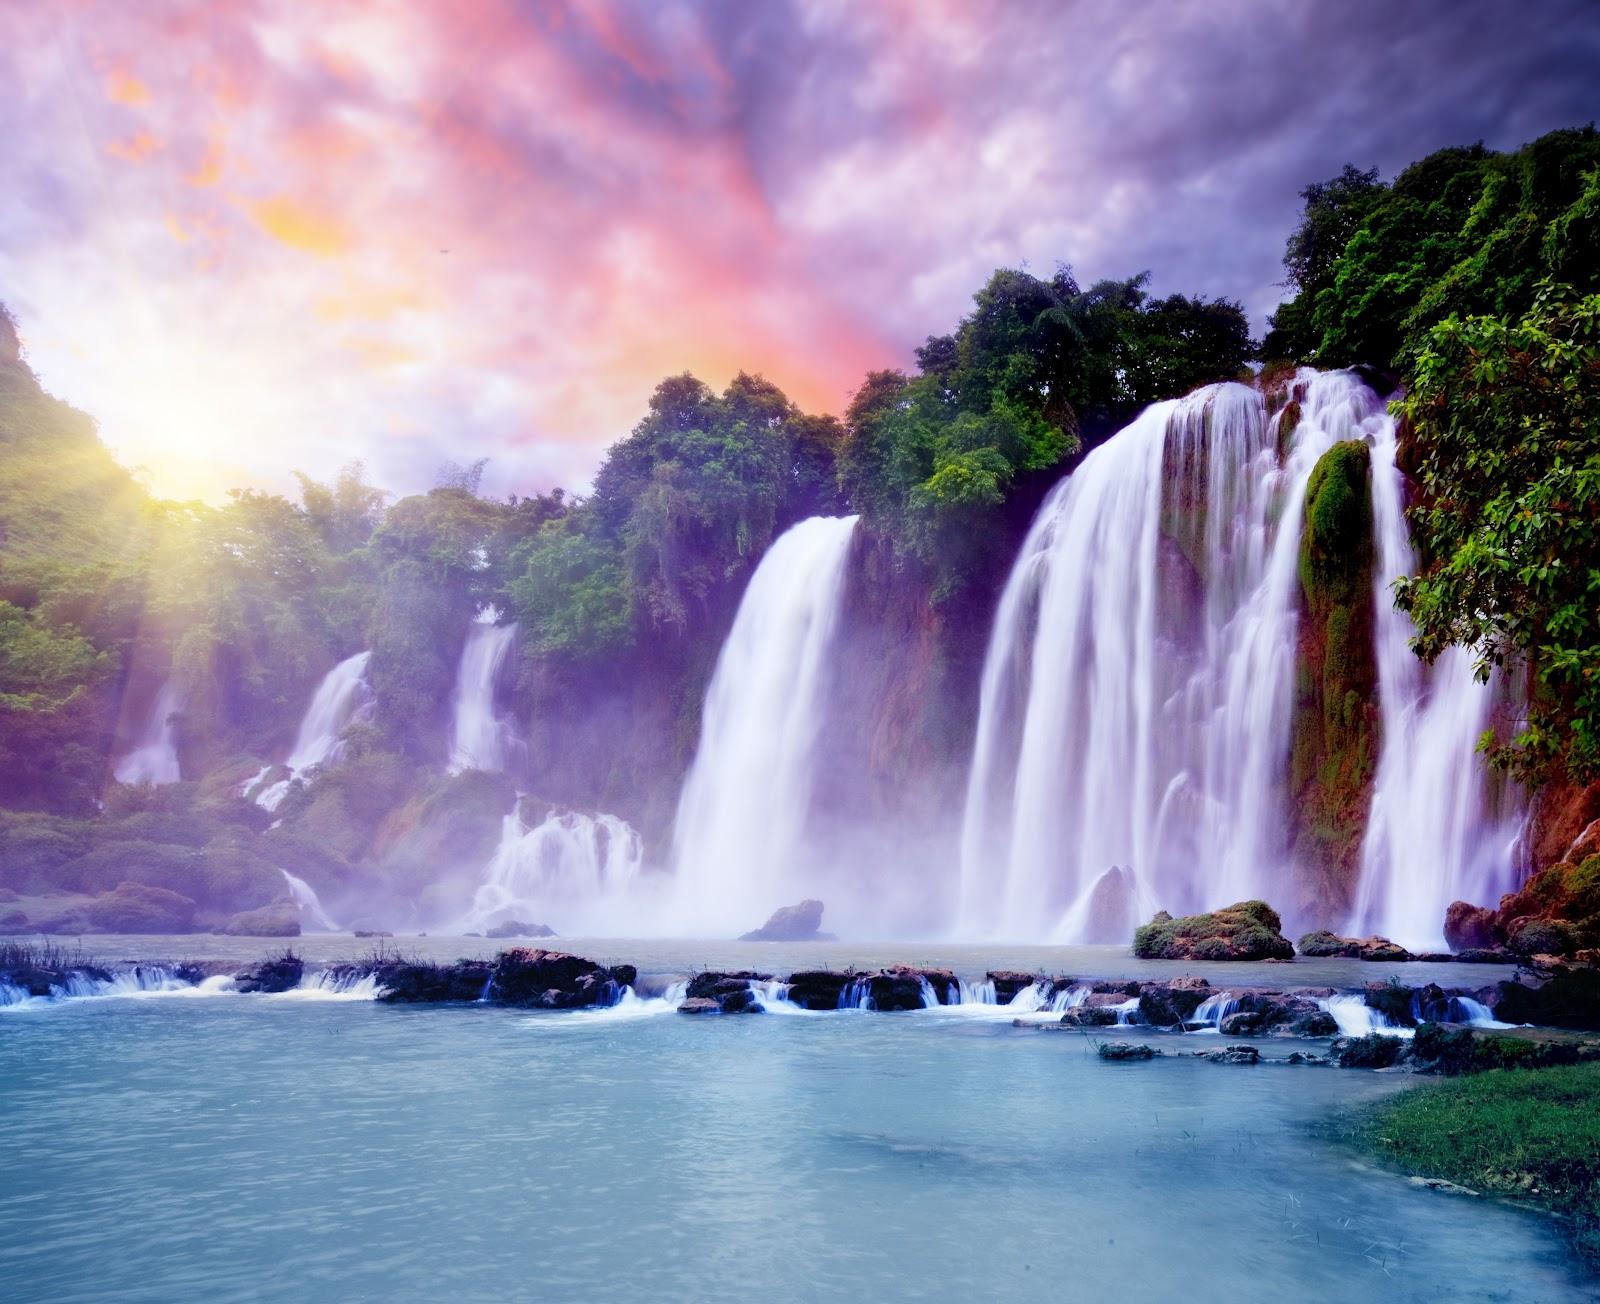 http://2.bp.blogspot.com/-I4rFFnNnJog/T9gcheTccqI/AAAAAAAARto/f9TMPOco9xY/s1600/beautiful+sky+wallpaper+(16).jpg